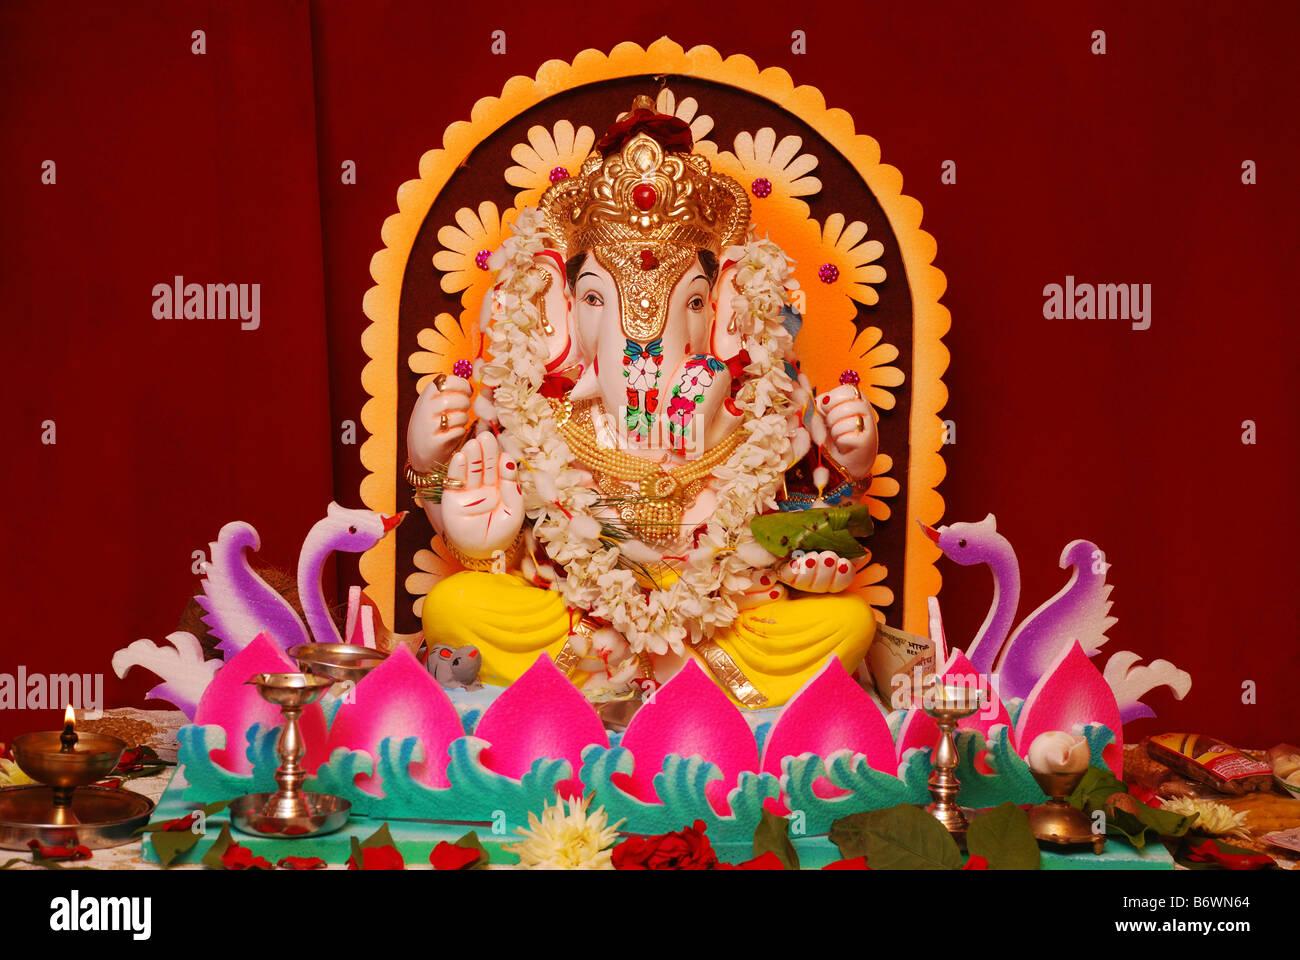 Plaster of Paris 3 dimensional statue of Hindu Deity Lord Ganesh. Maharashtra, India. - Stock Image